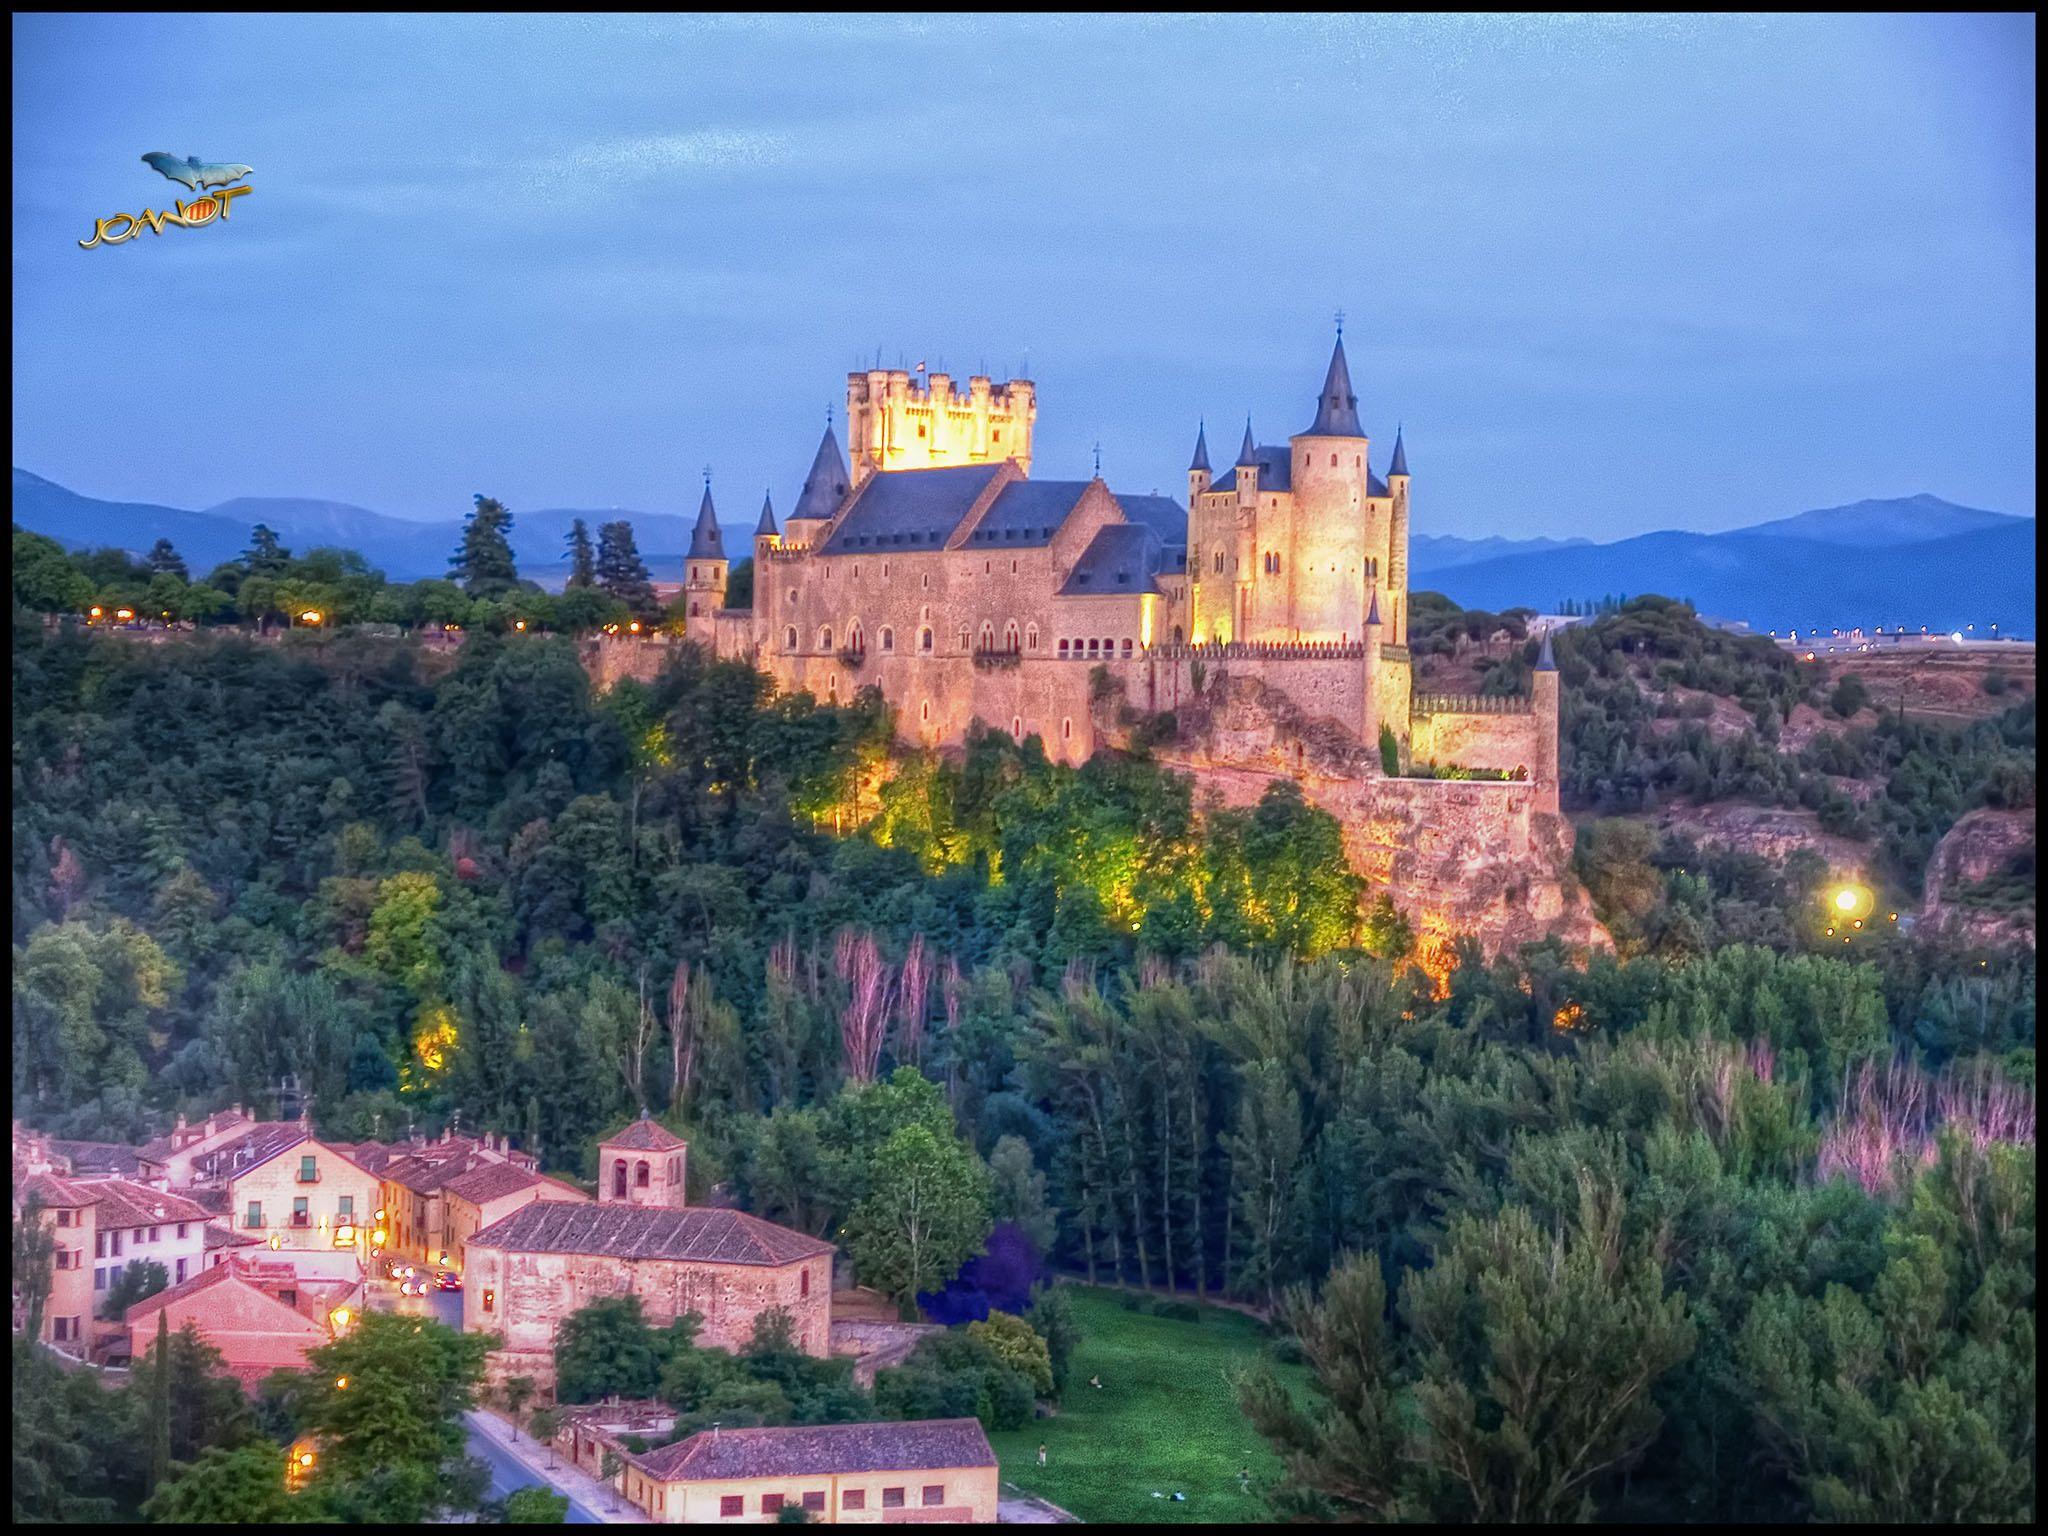 https//flic.kr/p/FzP1HY 6002 Segovia XL Segovia